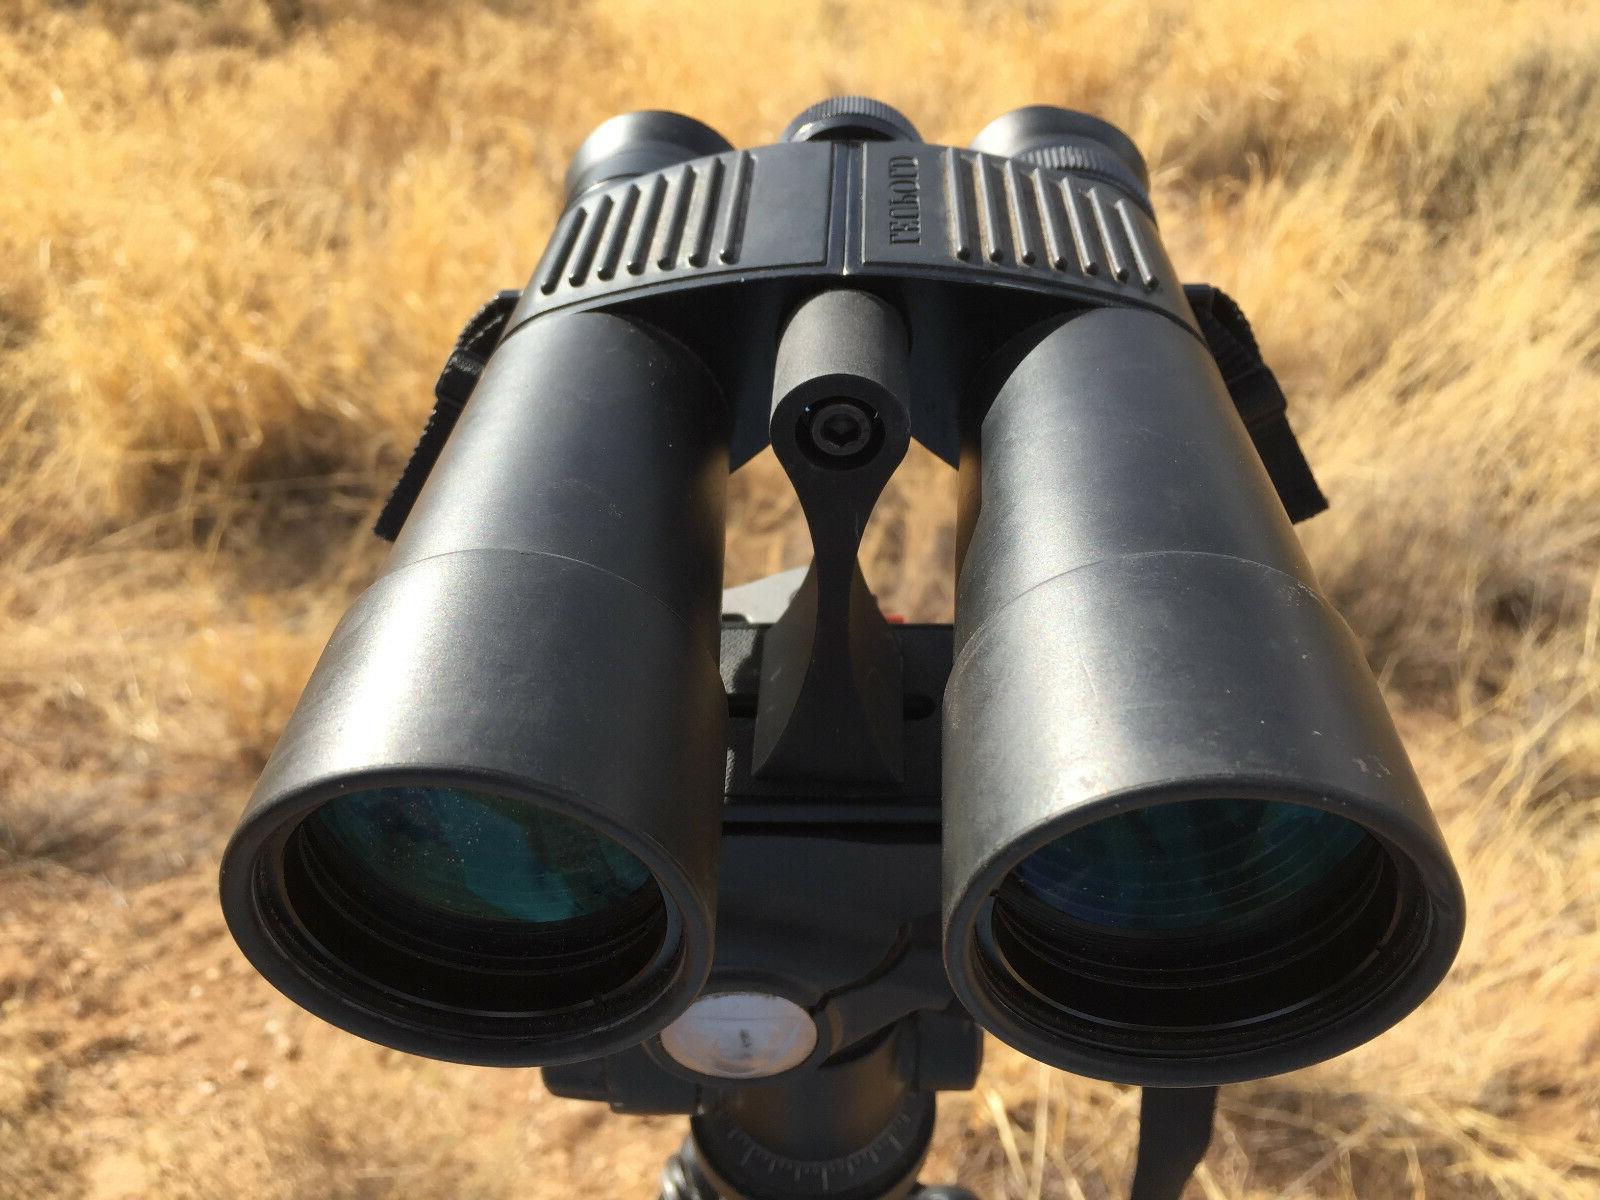 Universal Binocular to Tripod Adaptor Mount, Swarovski, Vort